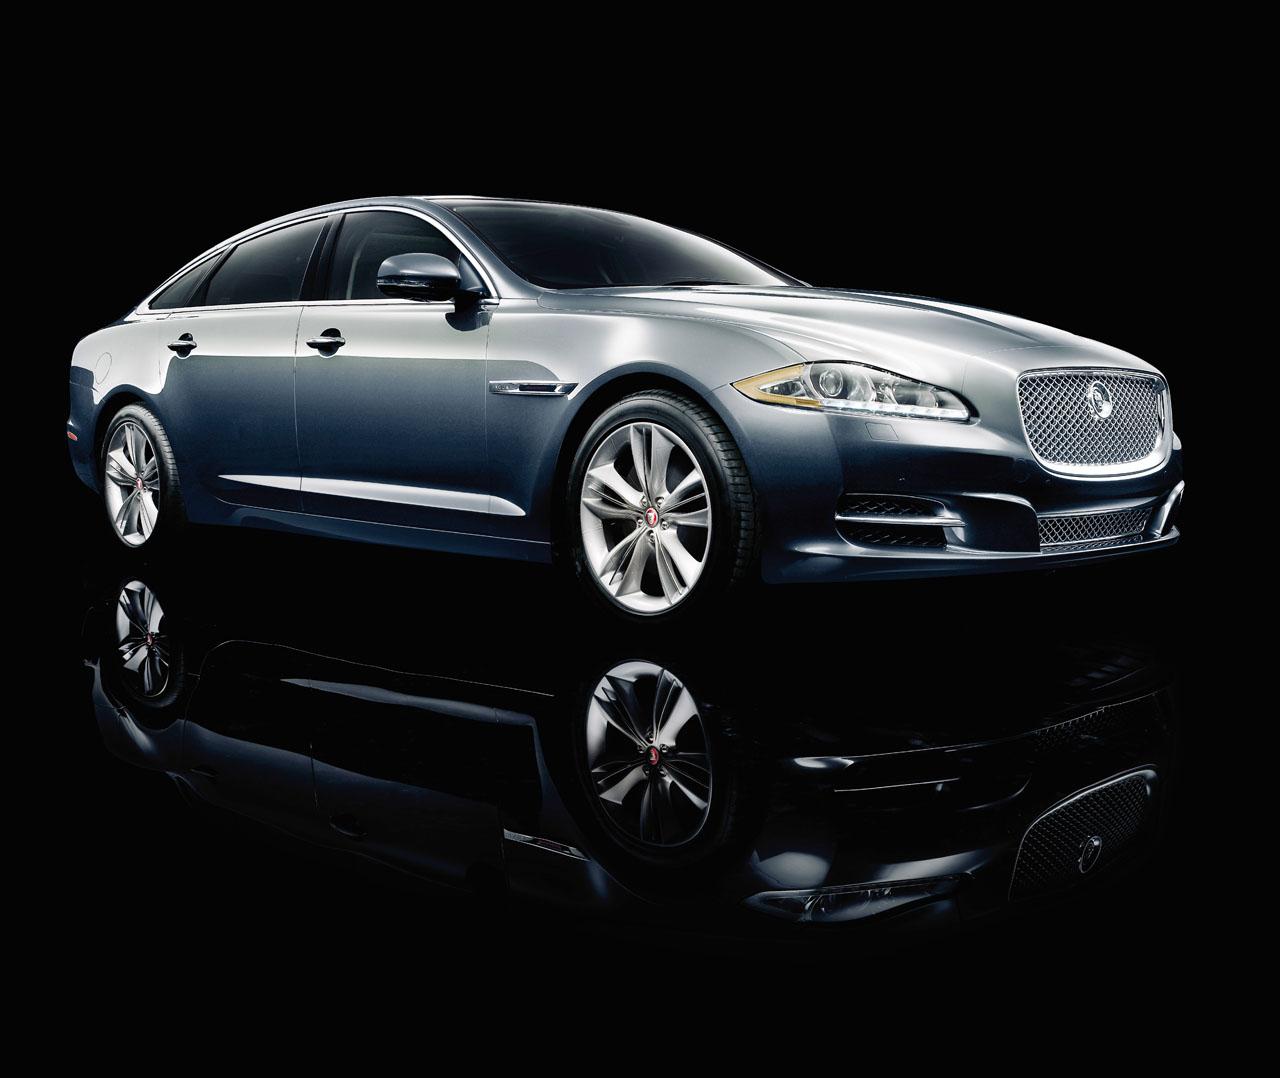 2010 Jaguar For Sale: Jaguar Rates Tops In J.D. Power Customer Service Study